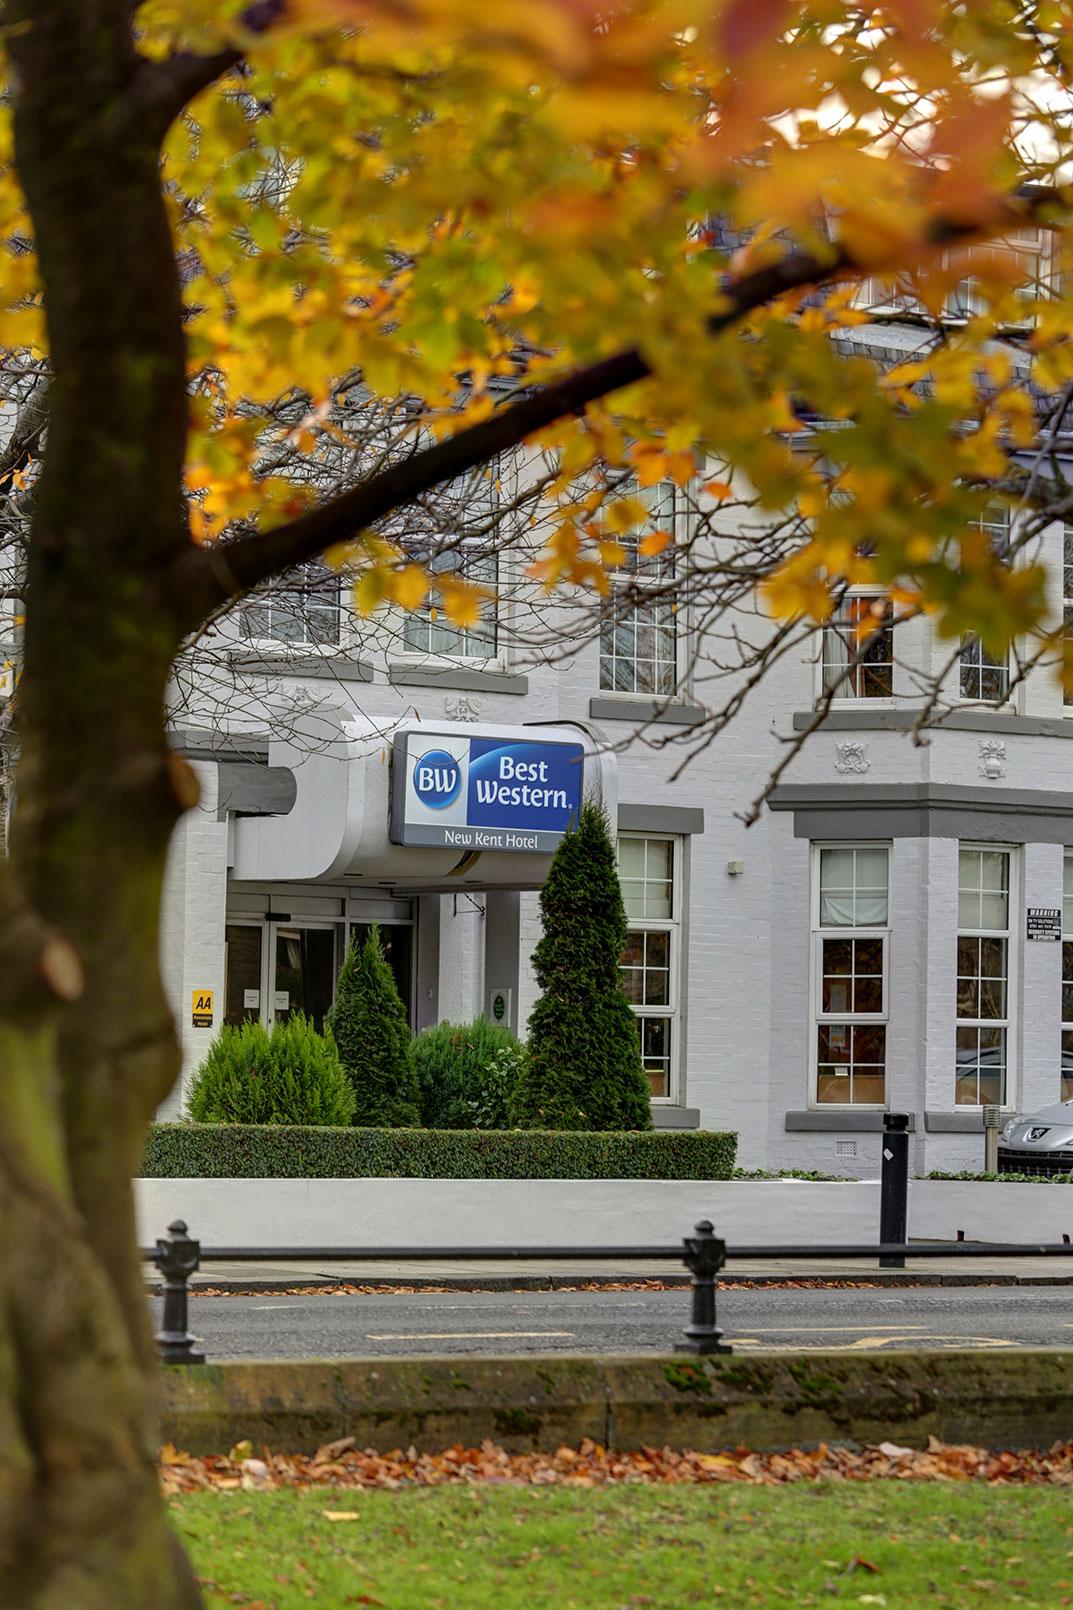 Best Western Hotel Room: Best Western New Kent Hotel